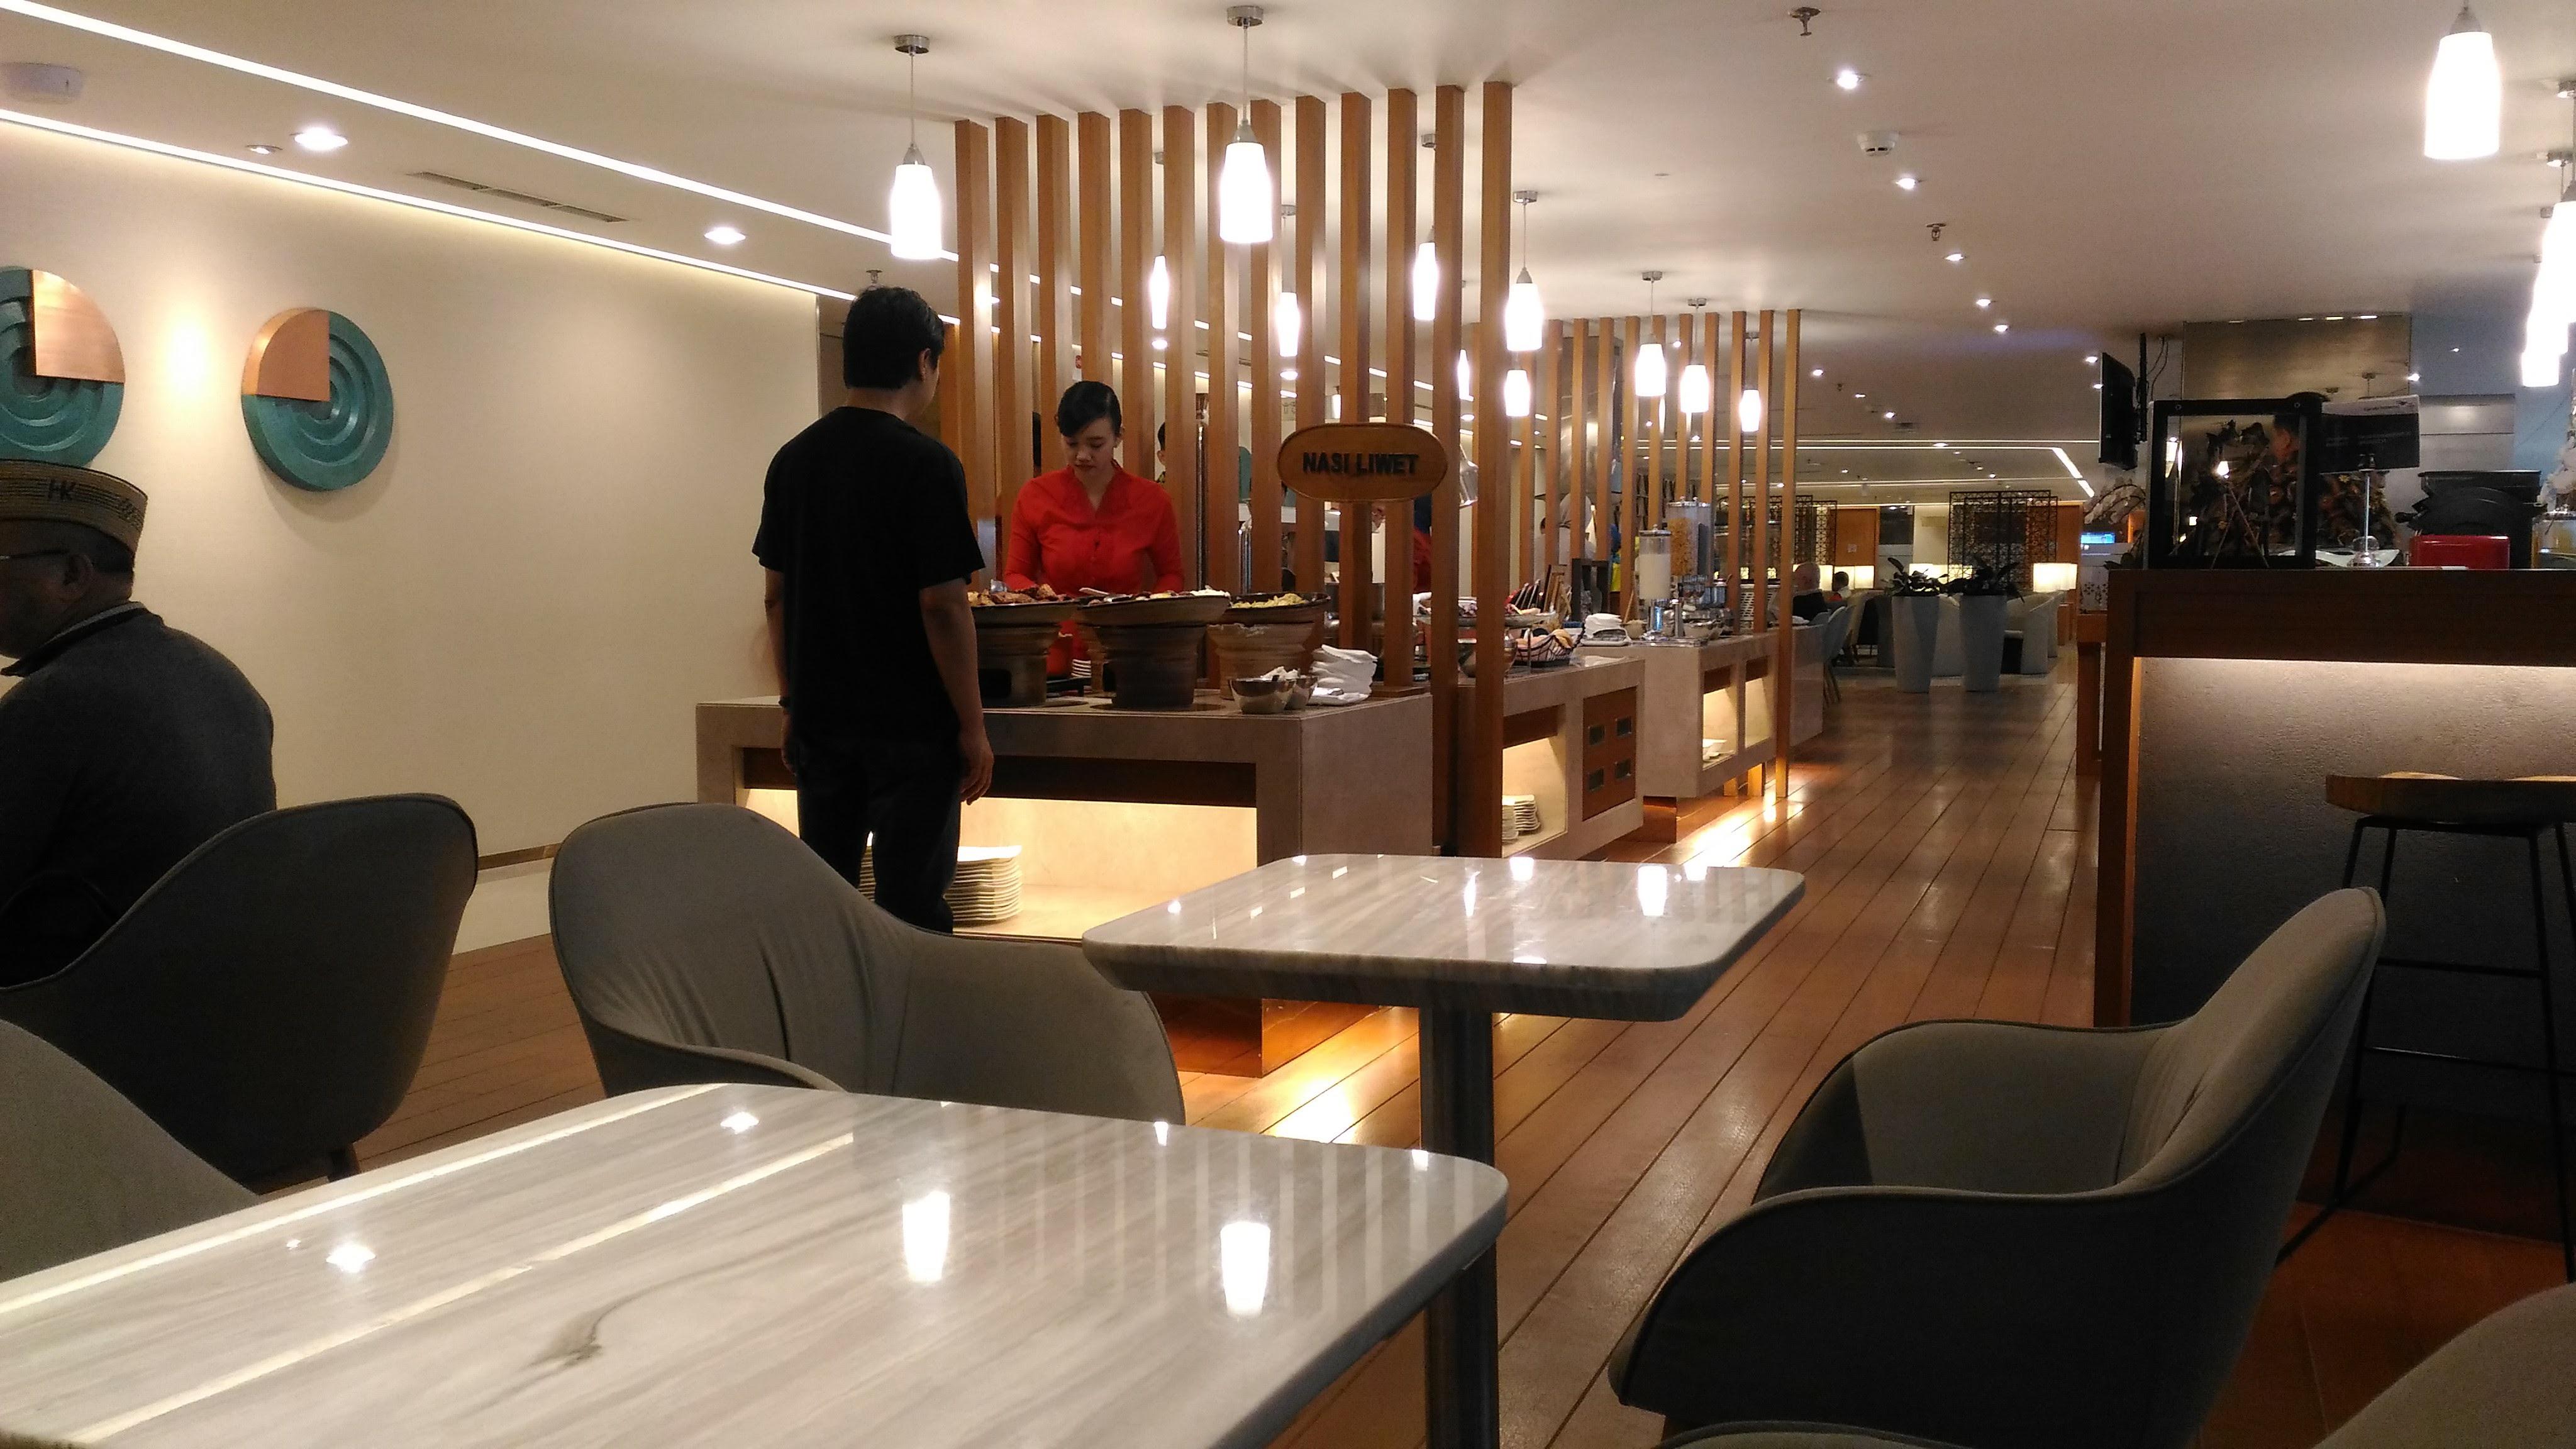 garuda indonesia customer service uk